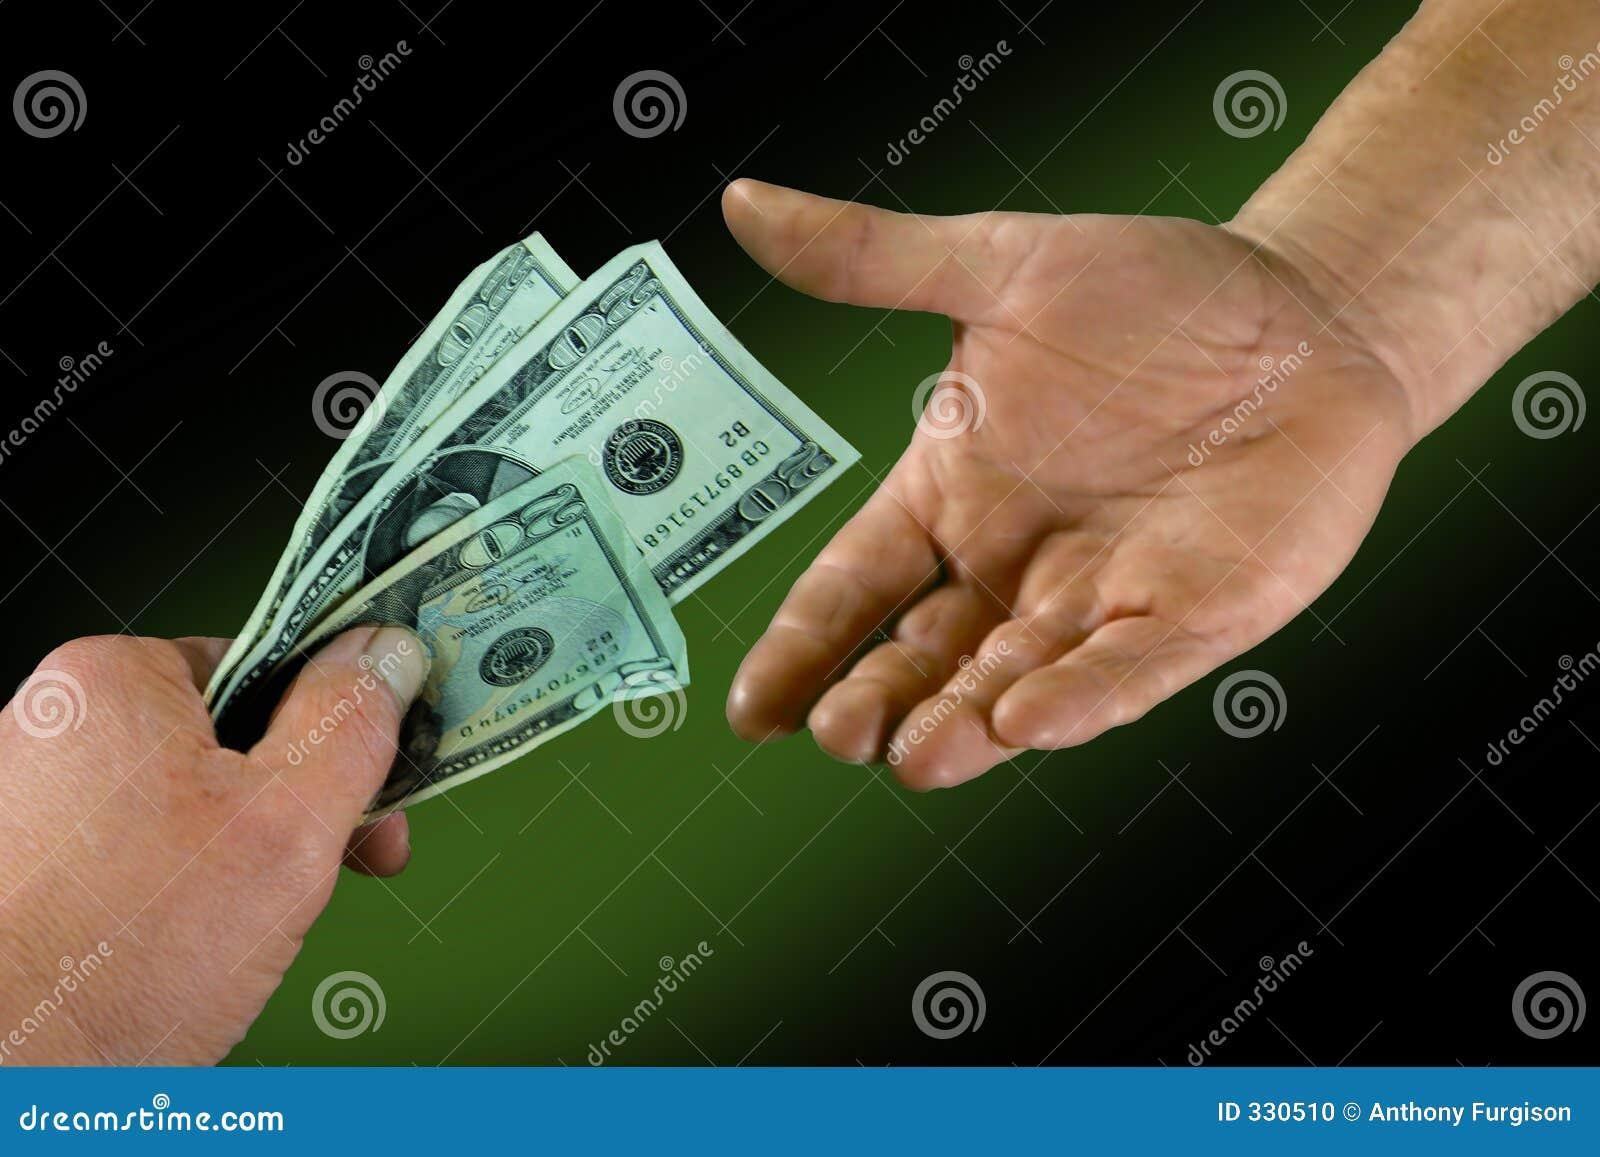 Account transaction